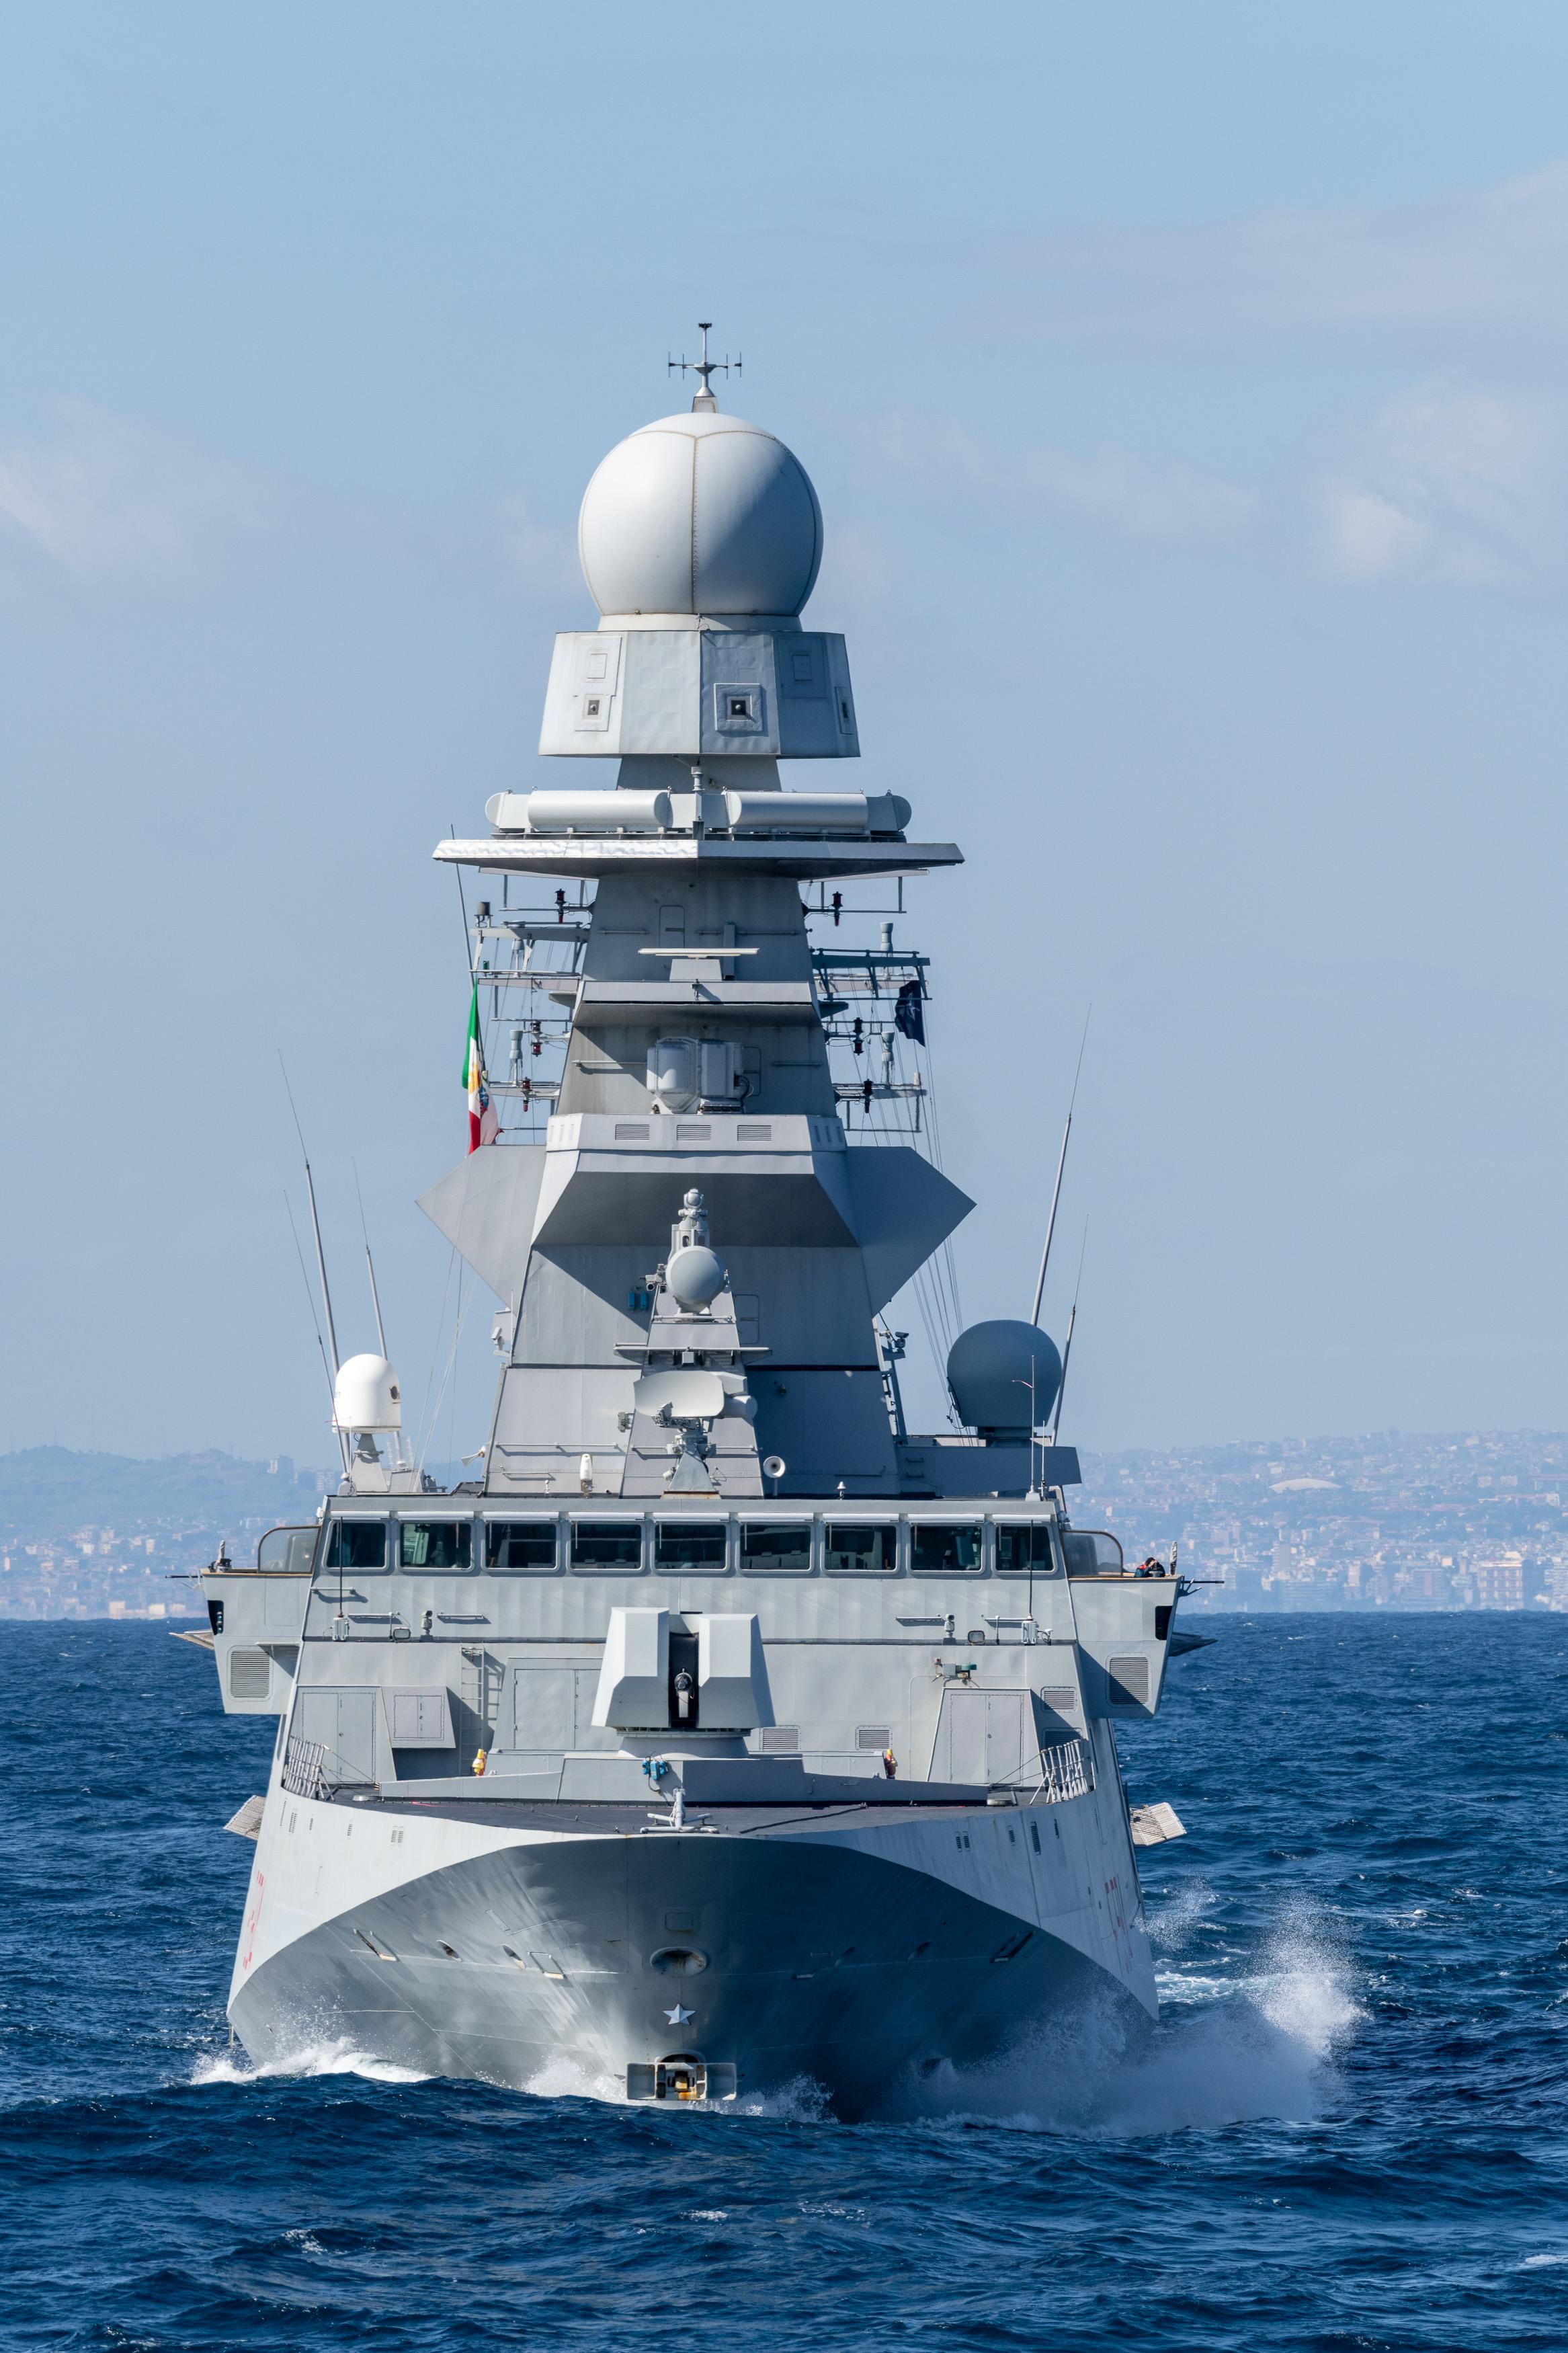 Italian Navy - Marine Italienne - Page 7 47170577342_7a7e52a5bb_o